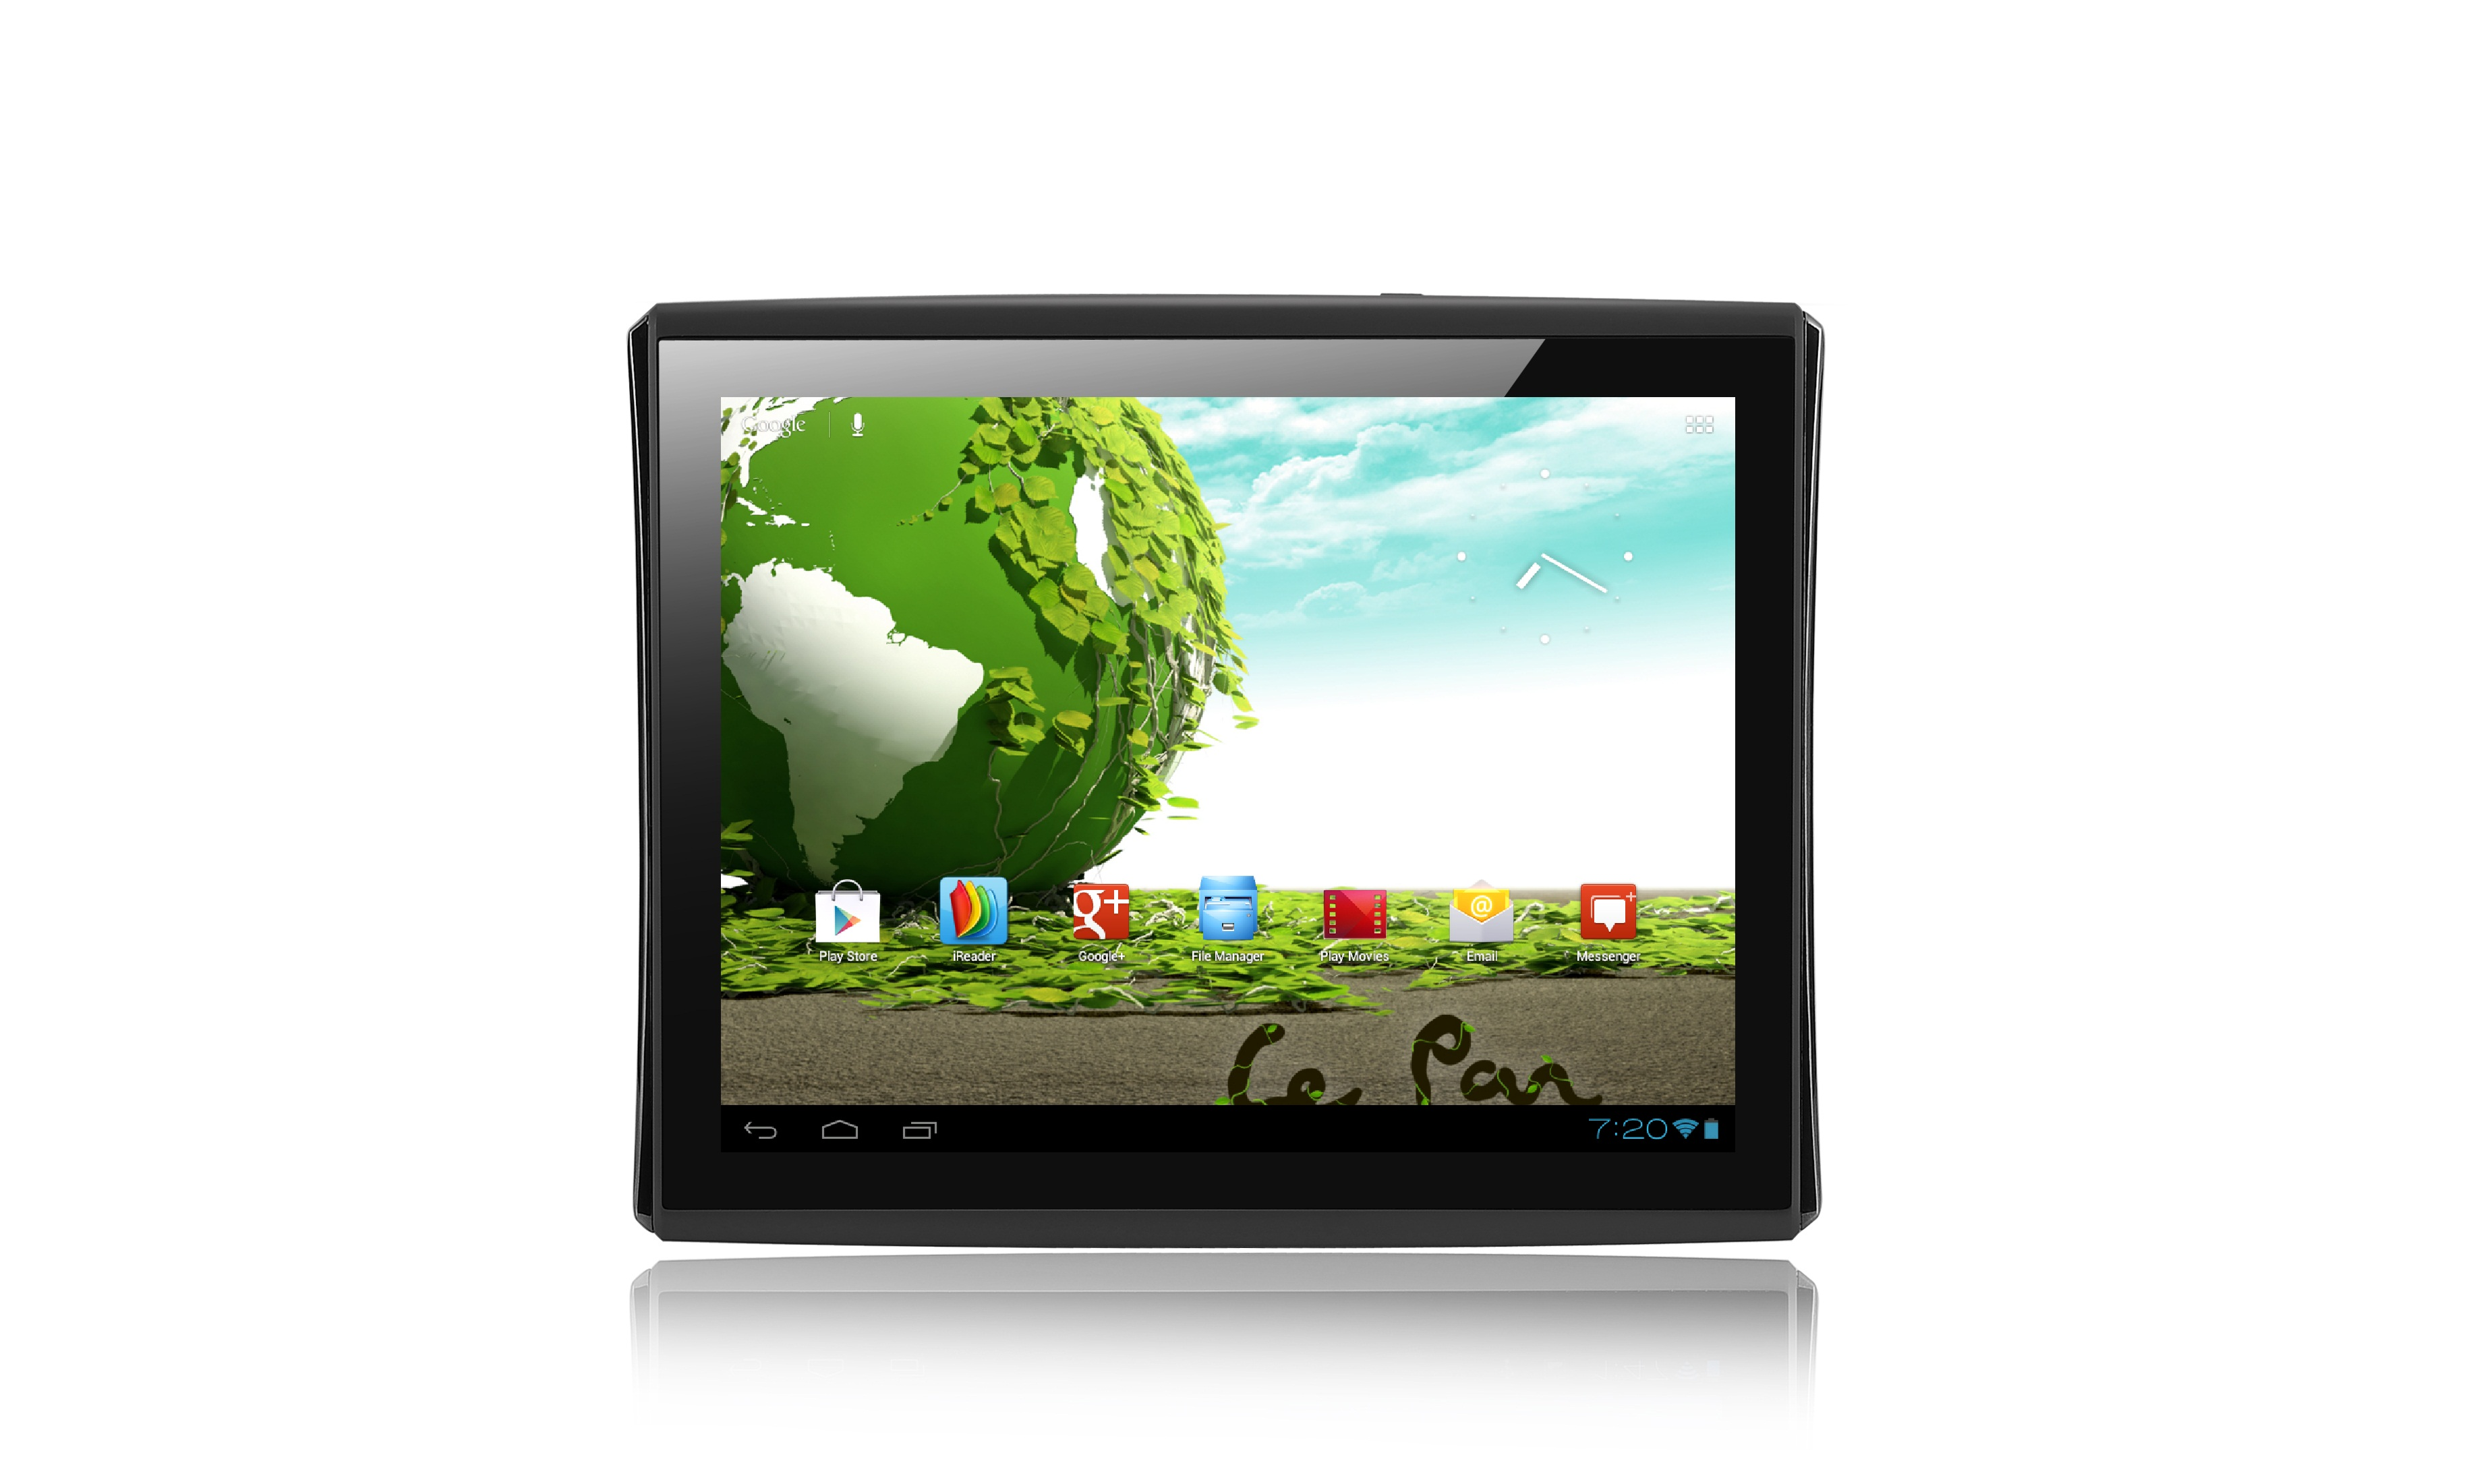 Download Le Pan Tablets USB ADB MTP Preloader Vcom Drivers